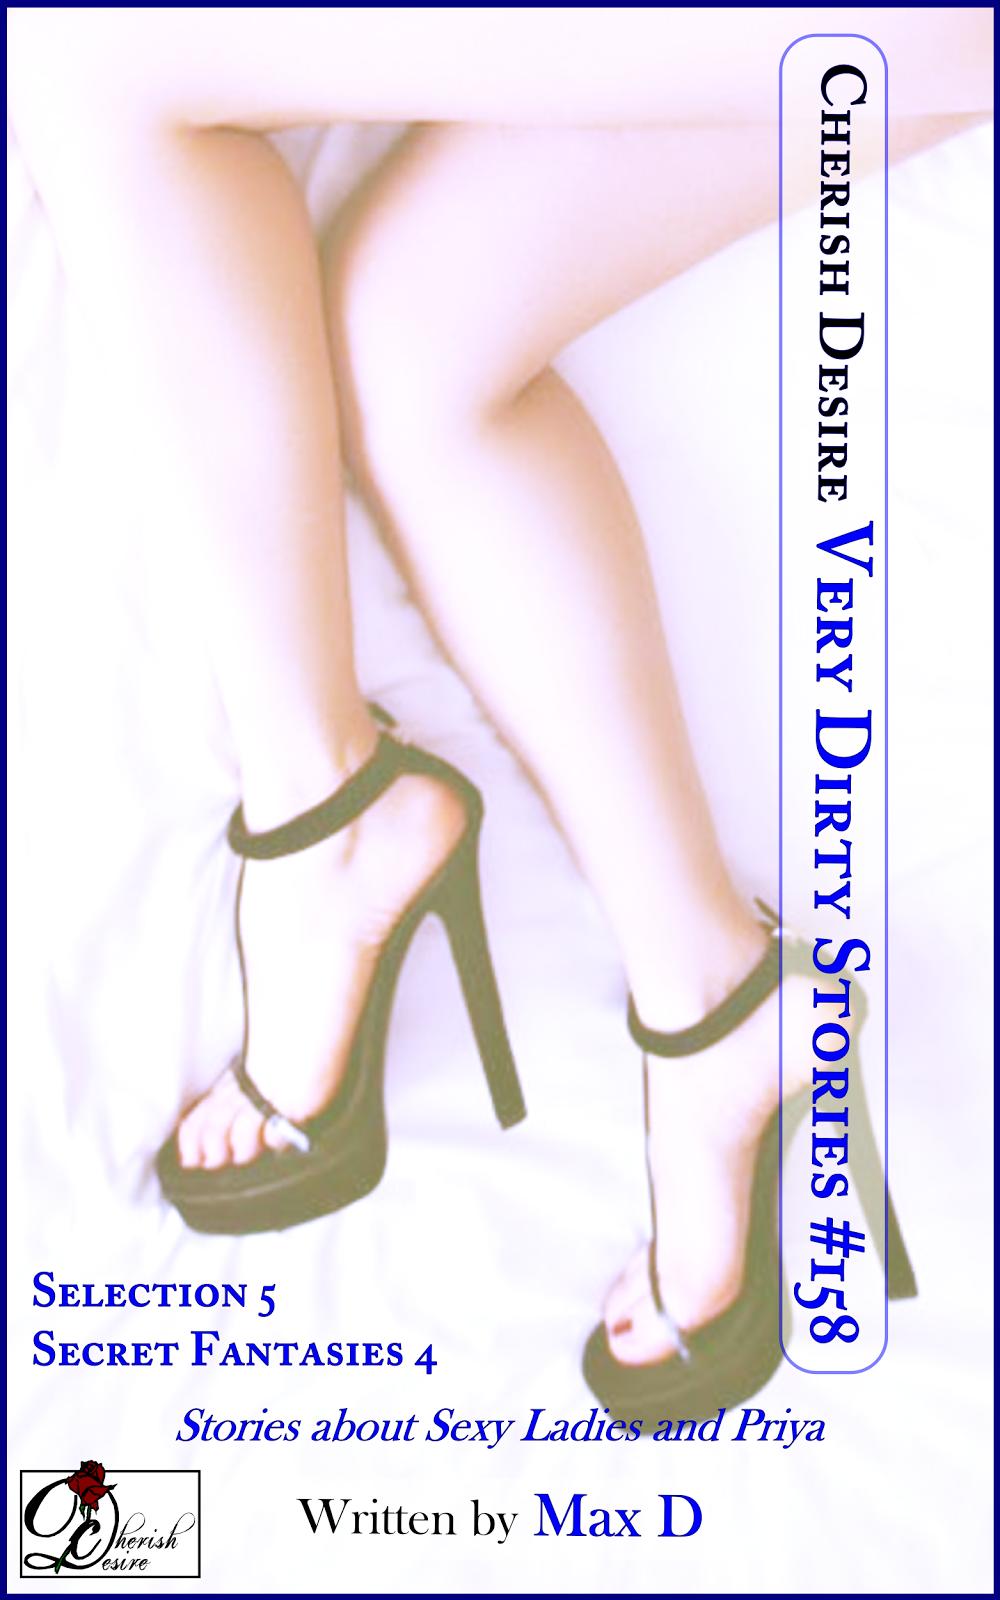 Cherish Desire: Very Dirty Stories #158, Max D, erotica